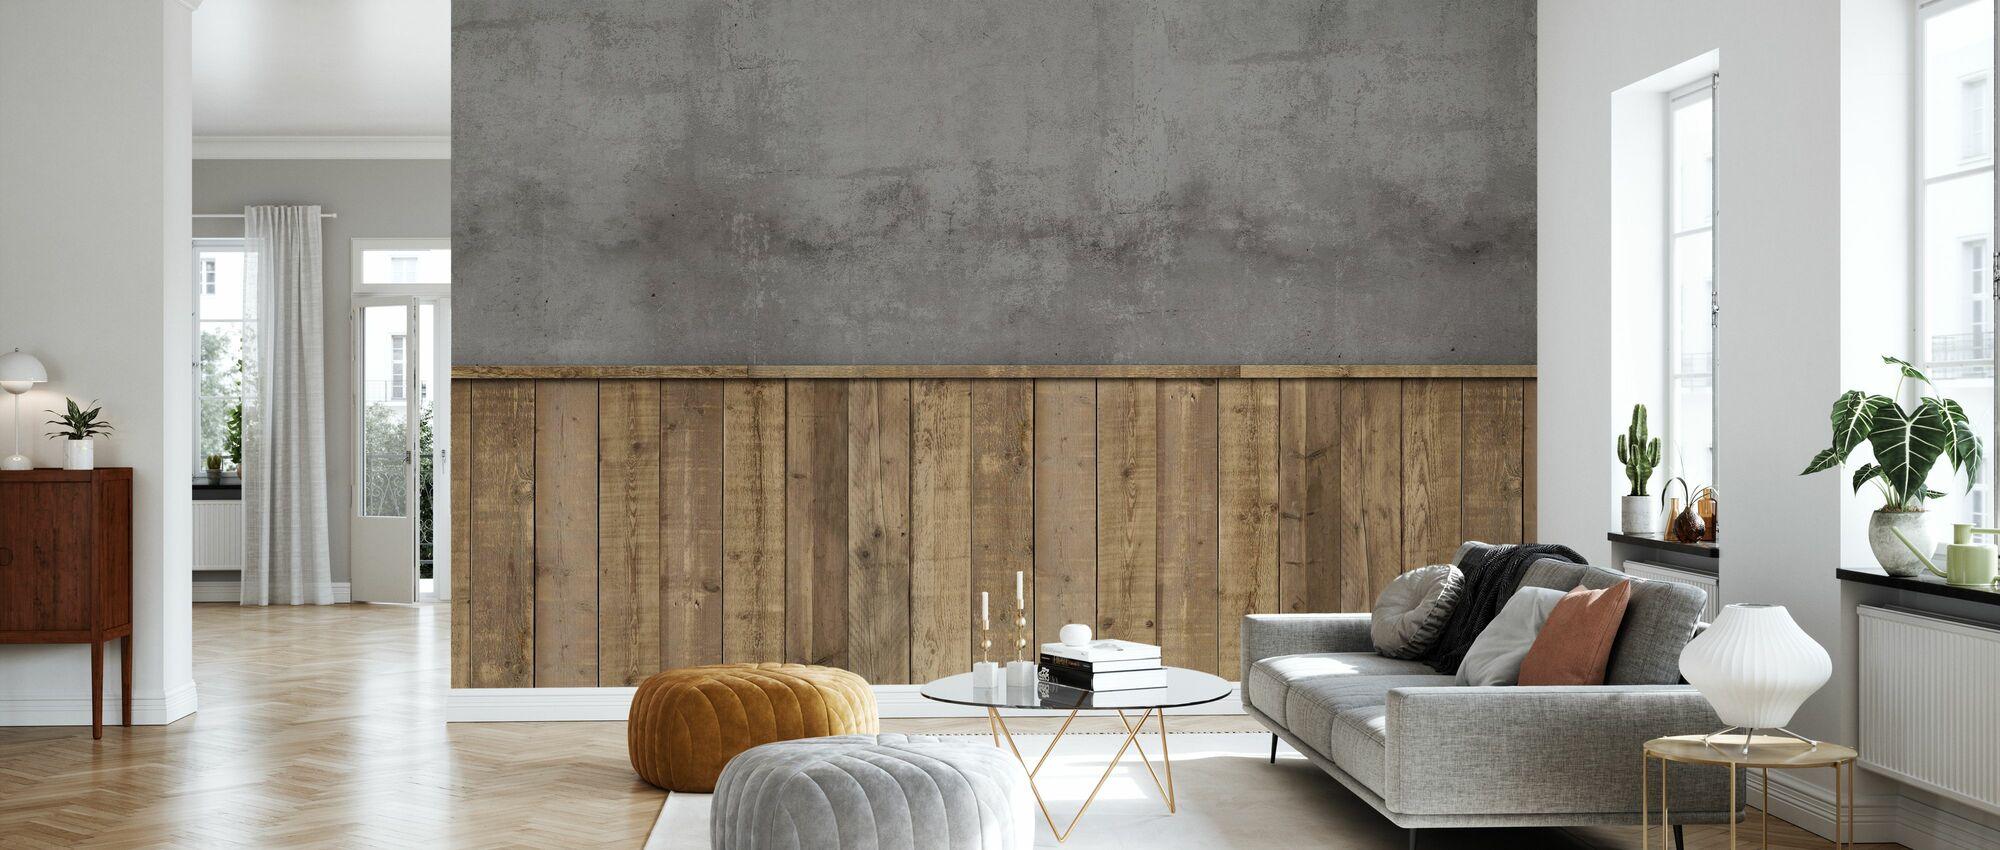 Rough Store Wall - Wallpaper - Living Room